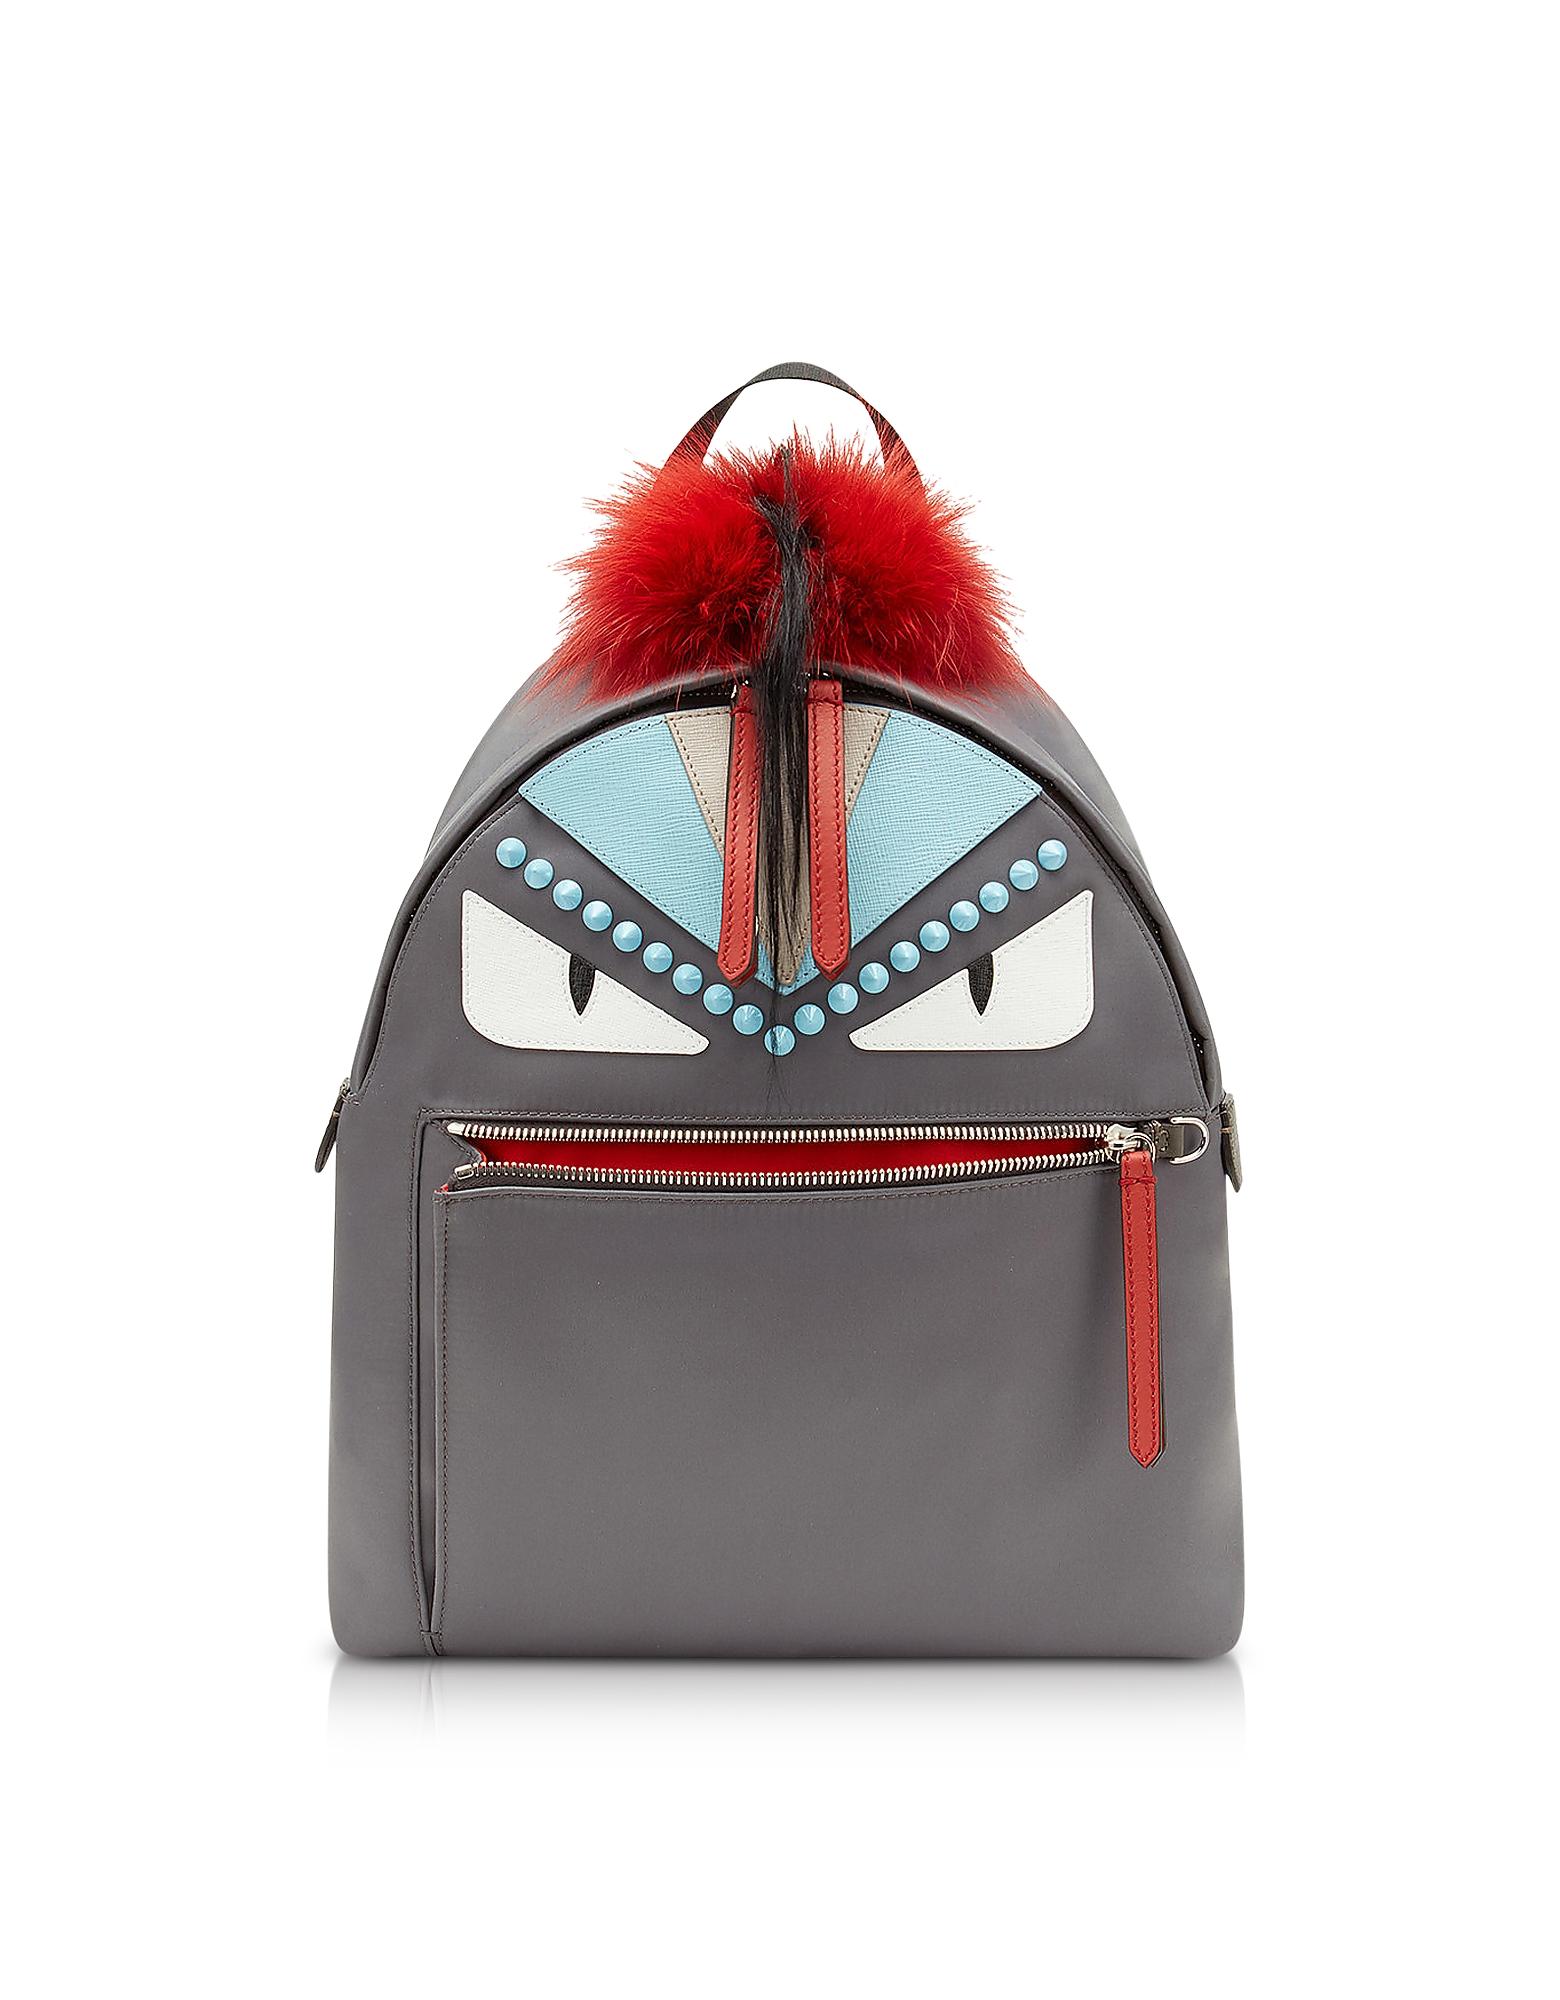 Fendi Handbags, Steel Gray Fabric and Red Fur Backpack w/Studs